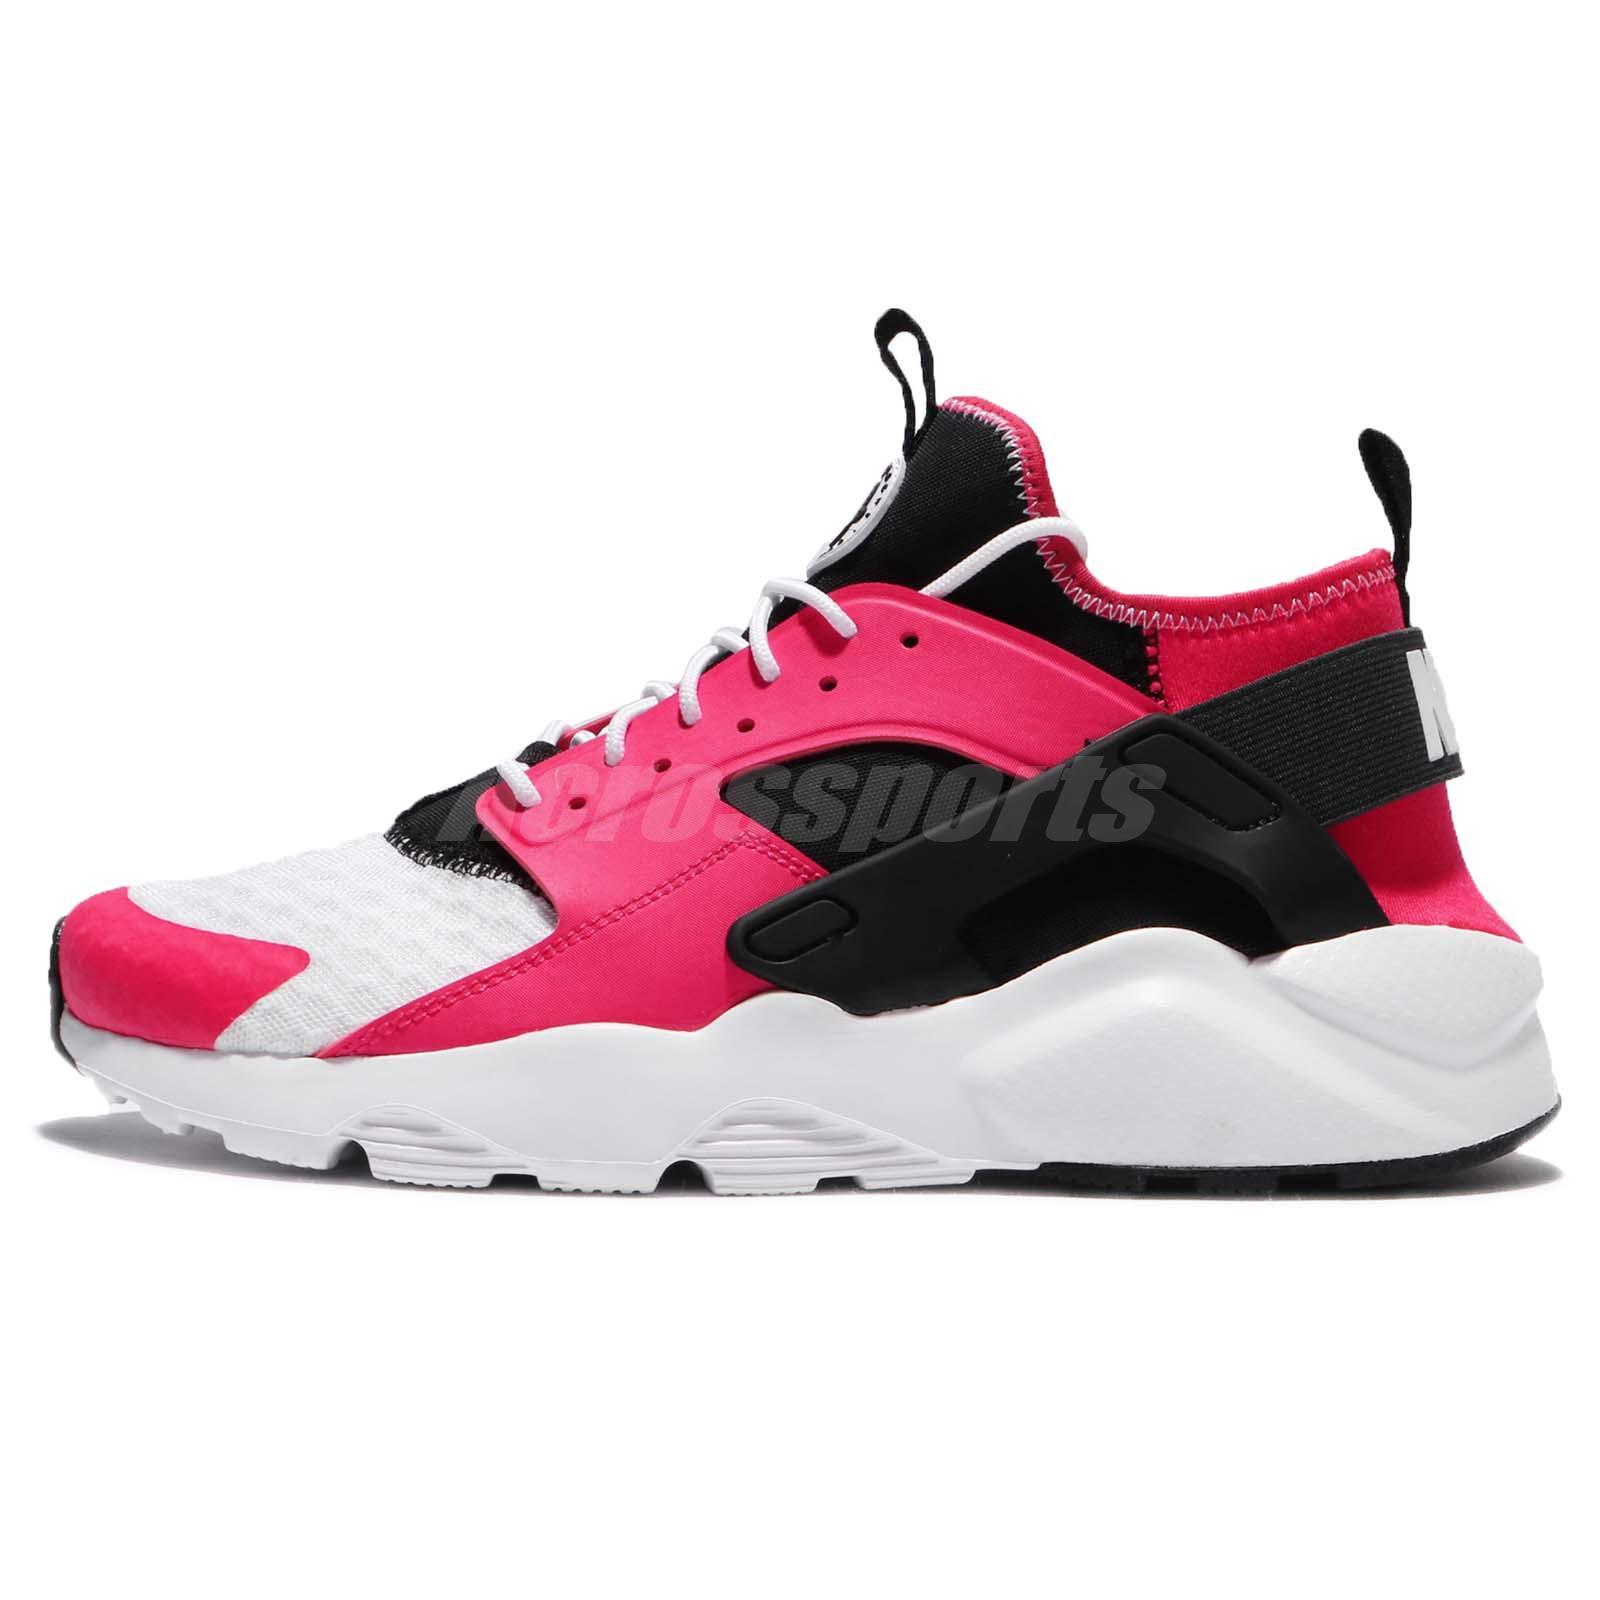 9d737f79ba89 Nike Air Huarache Run Ultra Siren Red Black White Men Shoes Sneaker 819685- 603